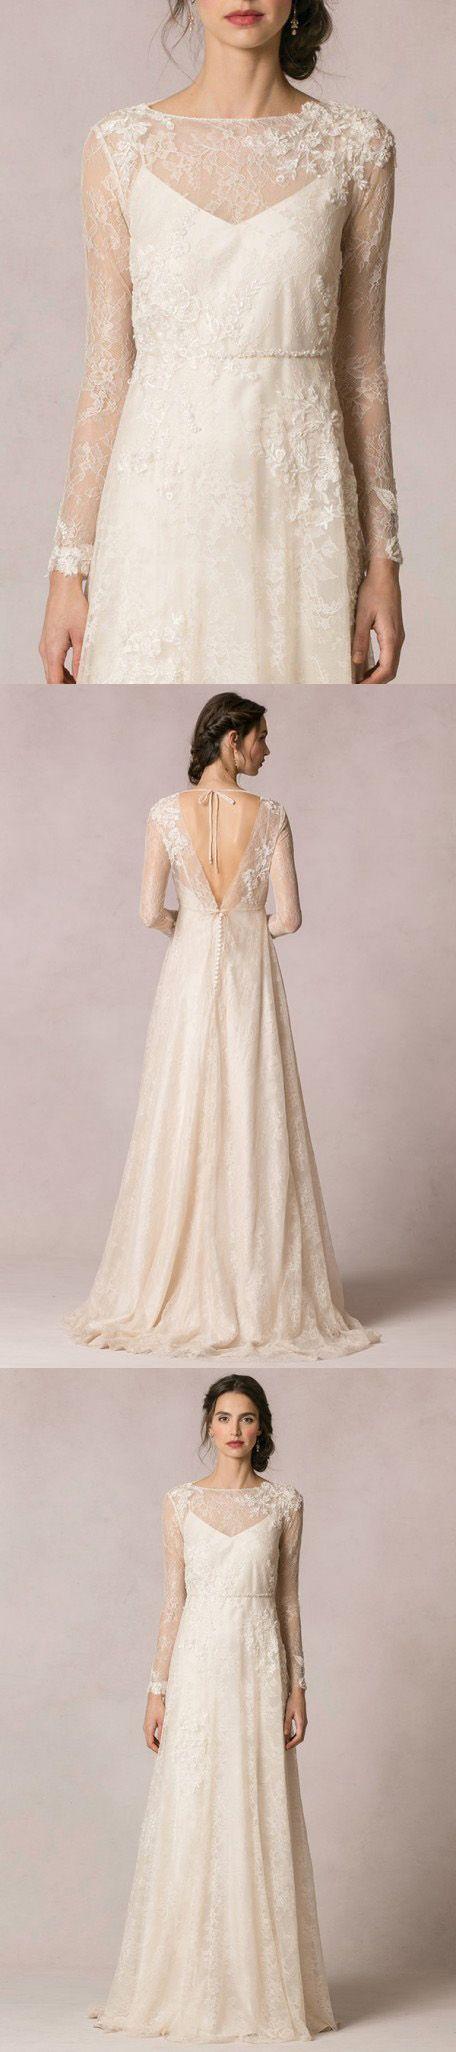 Pin by dressafford on long sleeve wedding dresses pinterest